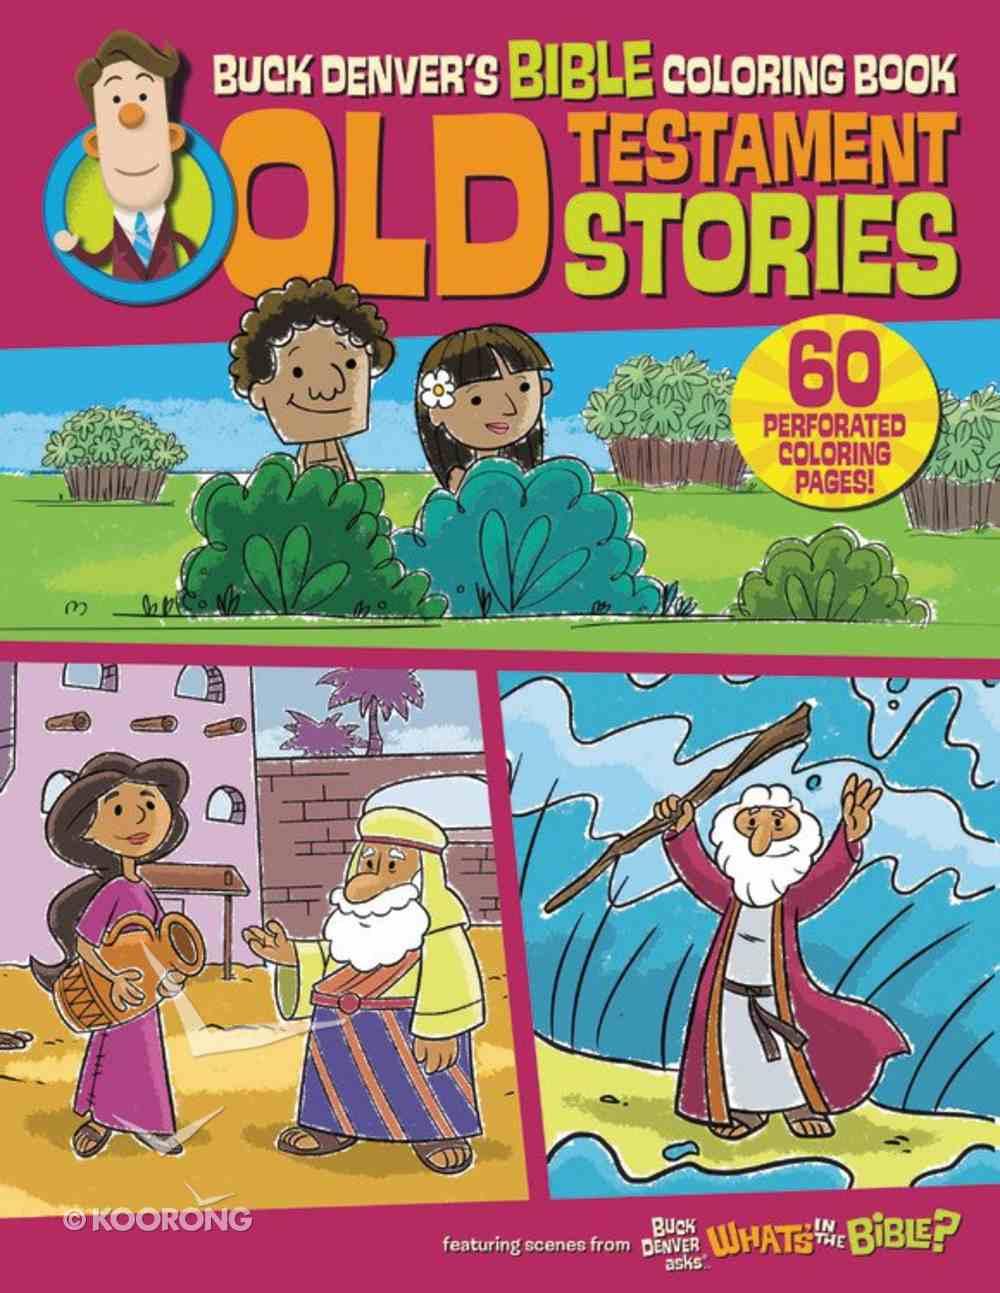 Buck Denver's Bible Coloring Book: Old Testament Stories Paperback